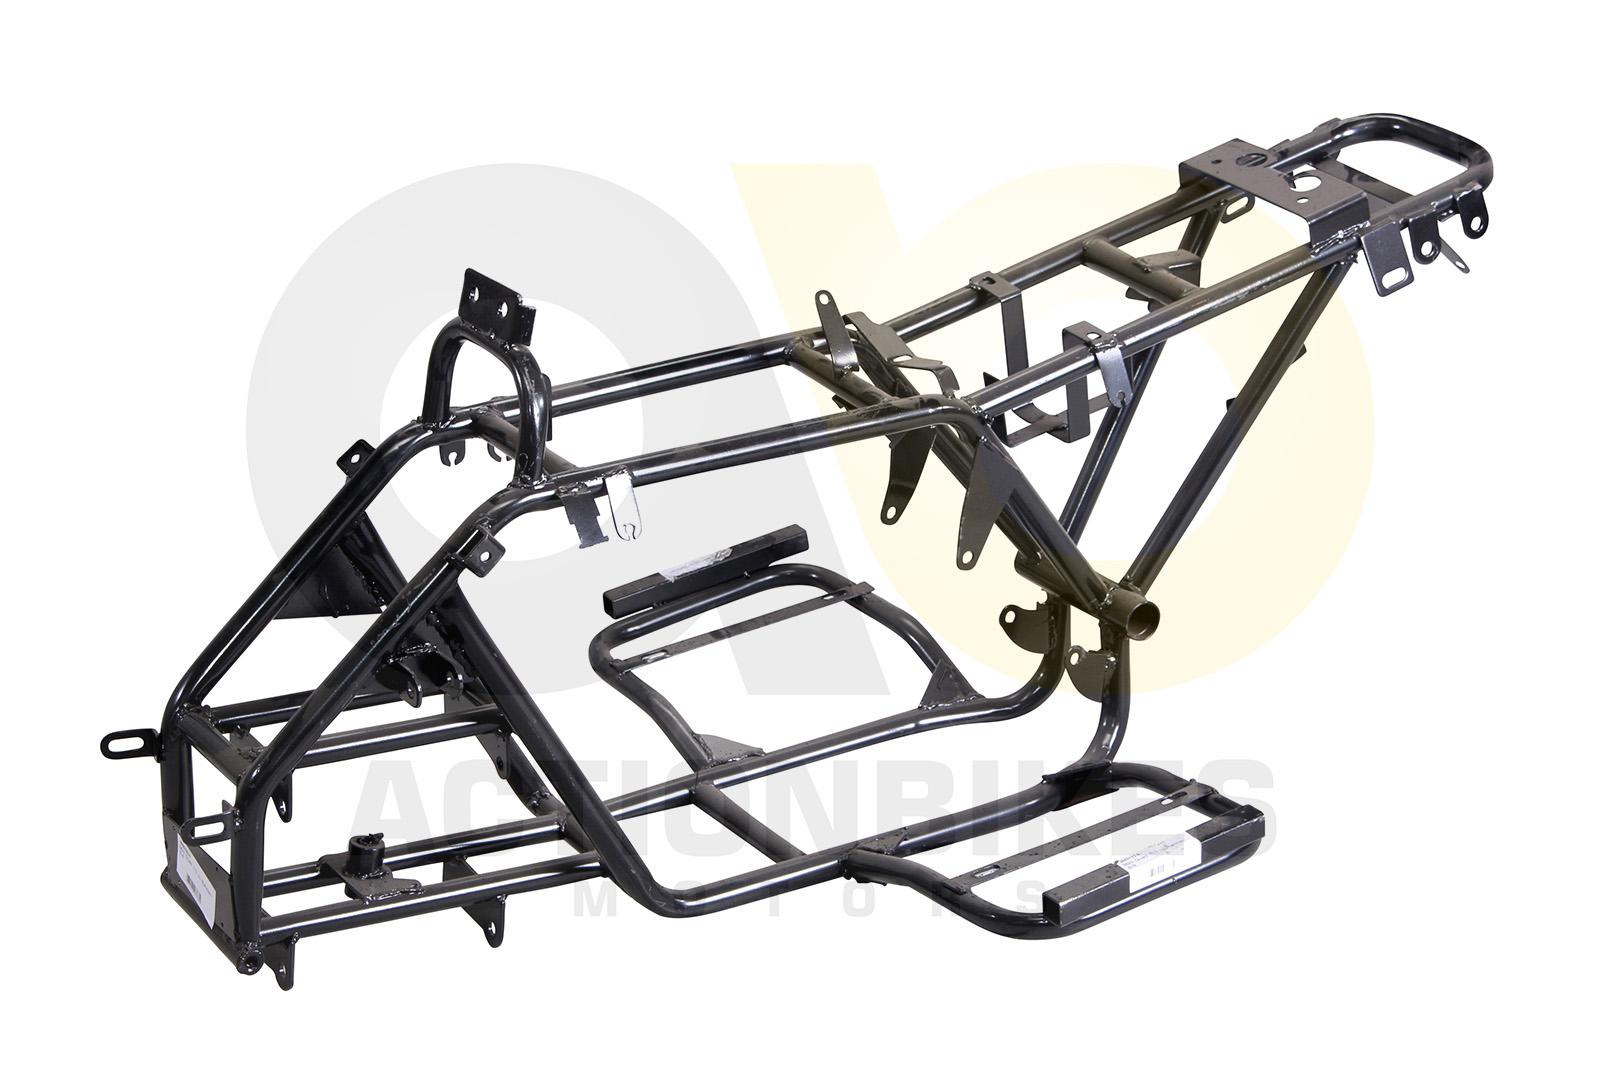 Mini Quad 110cc / 125cc Rahmen S-8 | Fahrzeug Rahmen | Ersatzteile ...